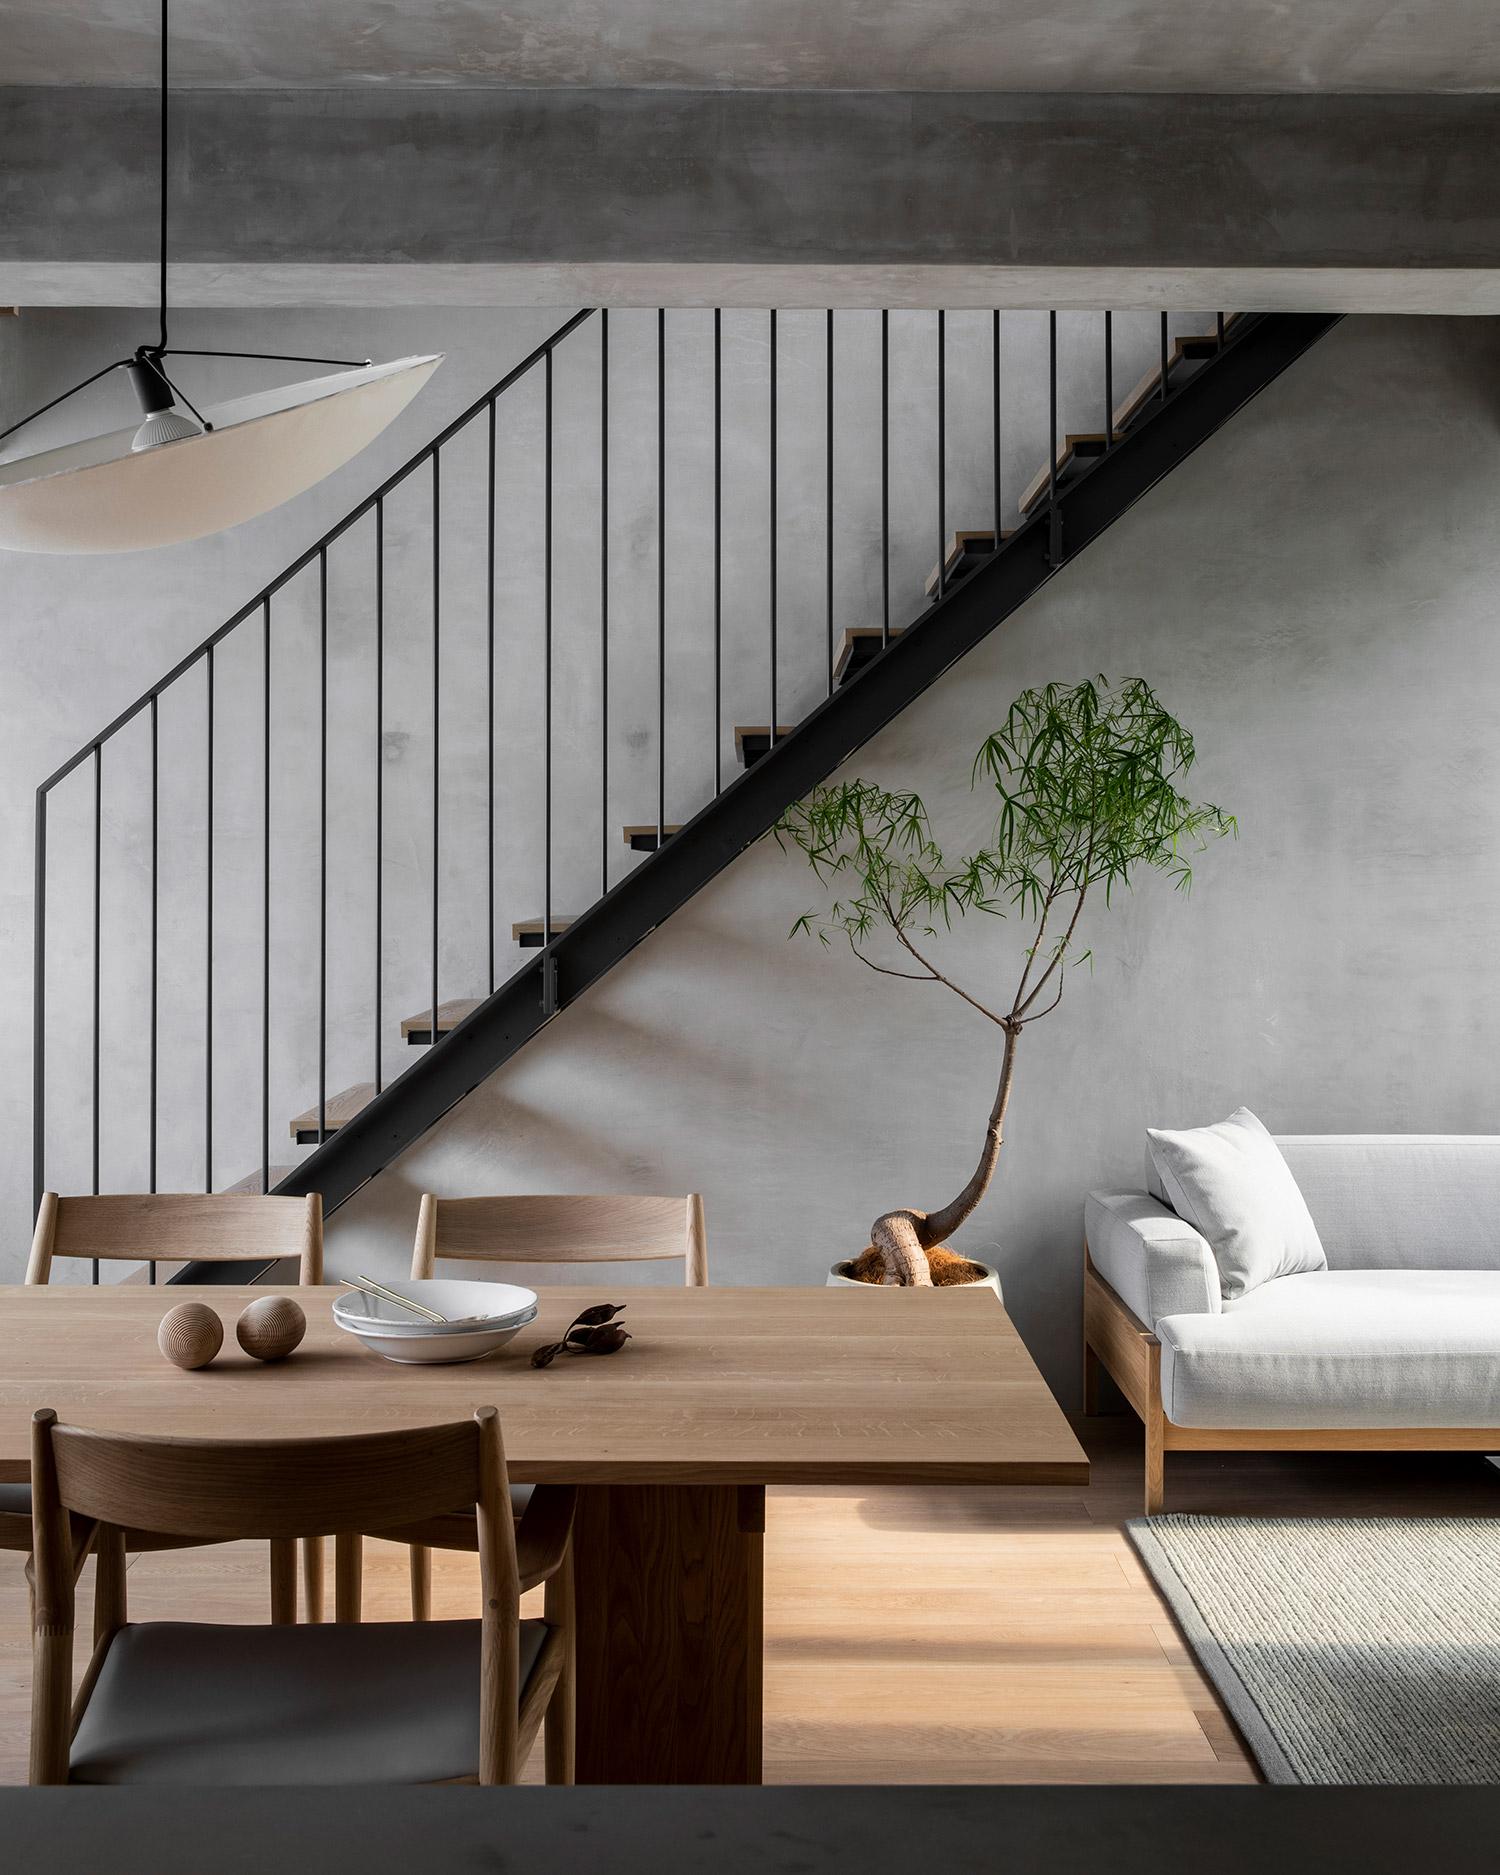 fine leaved Japanese tree in modern minimal concrete interior